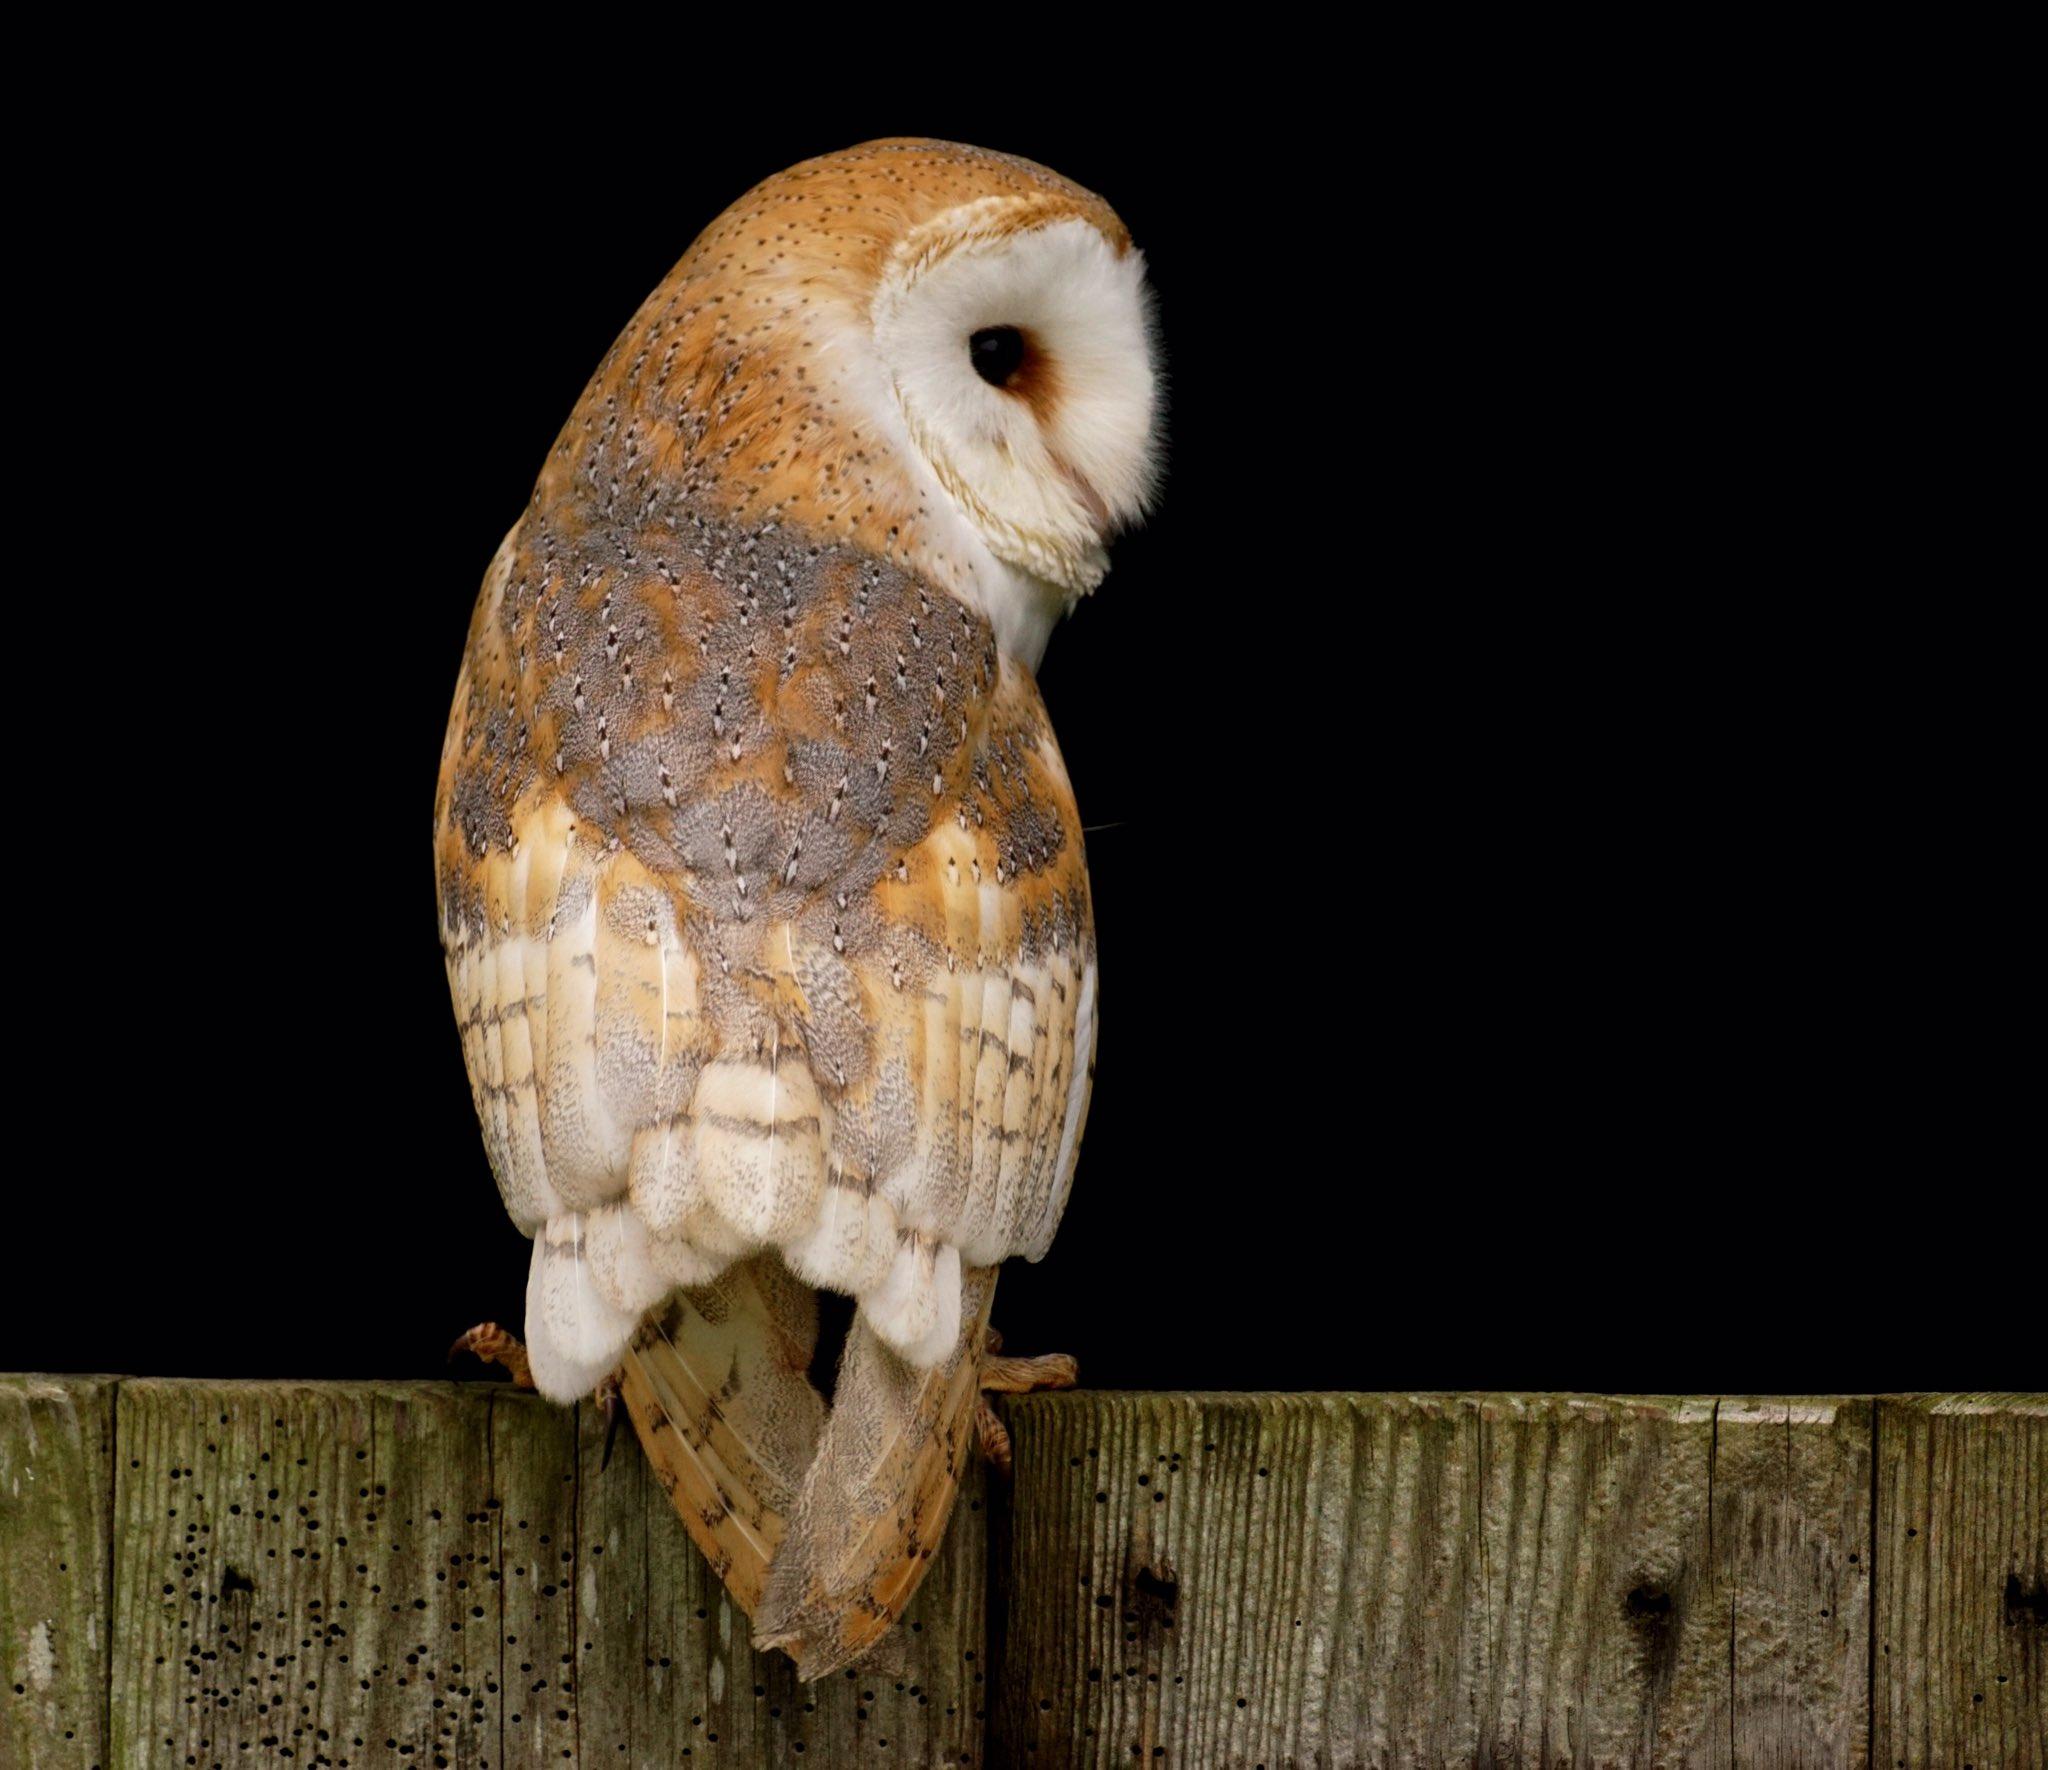 wildlife_photography_9.jpg